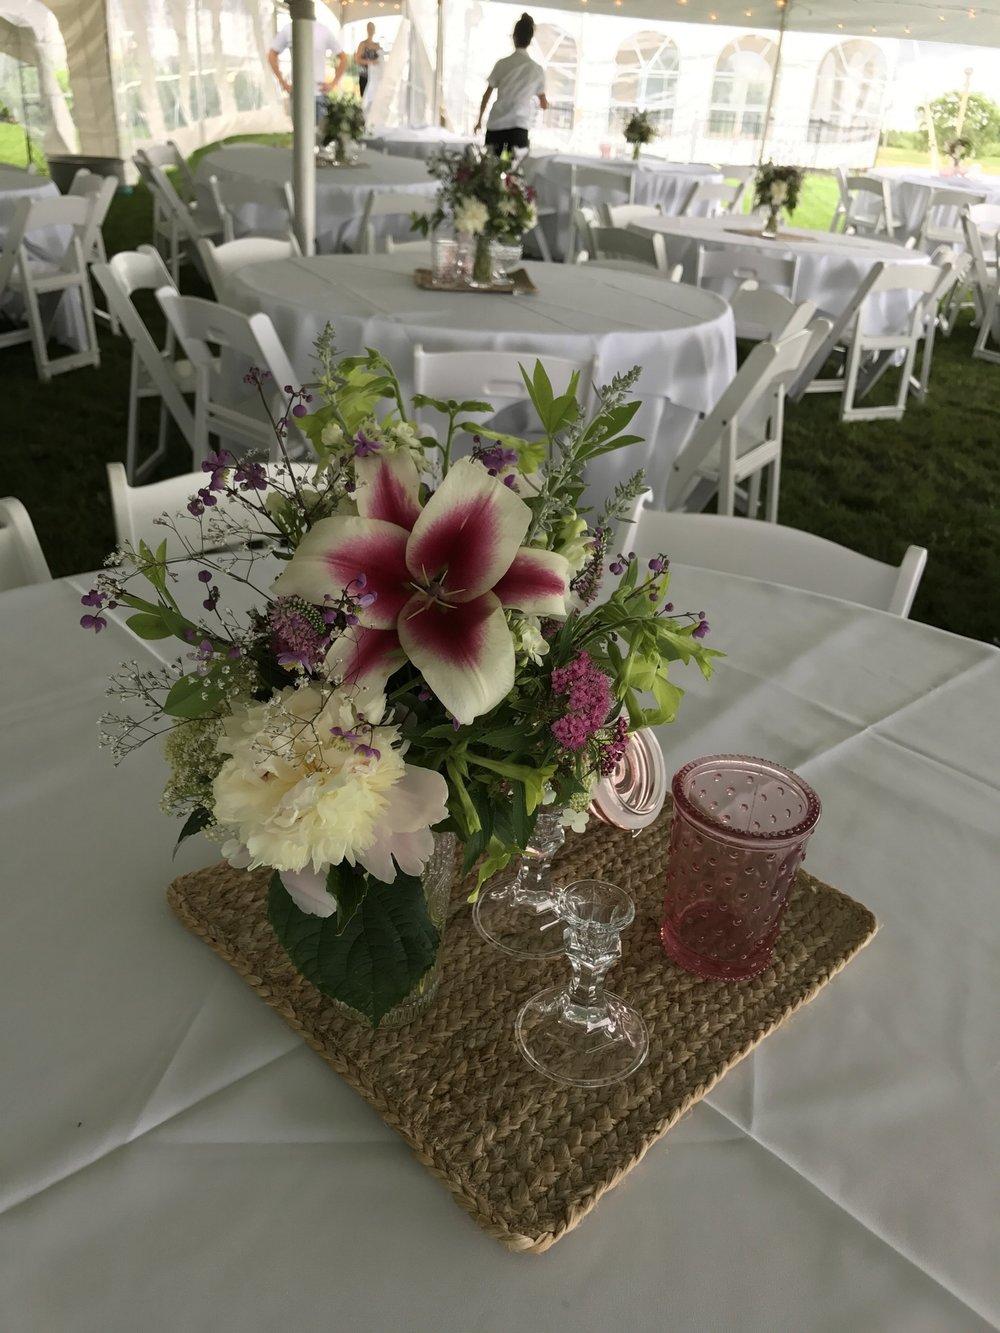 Mid-July Vase Centerpiece